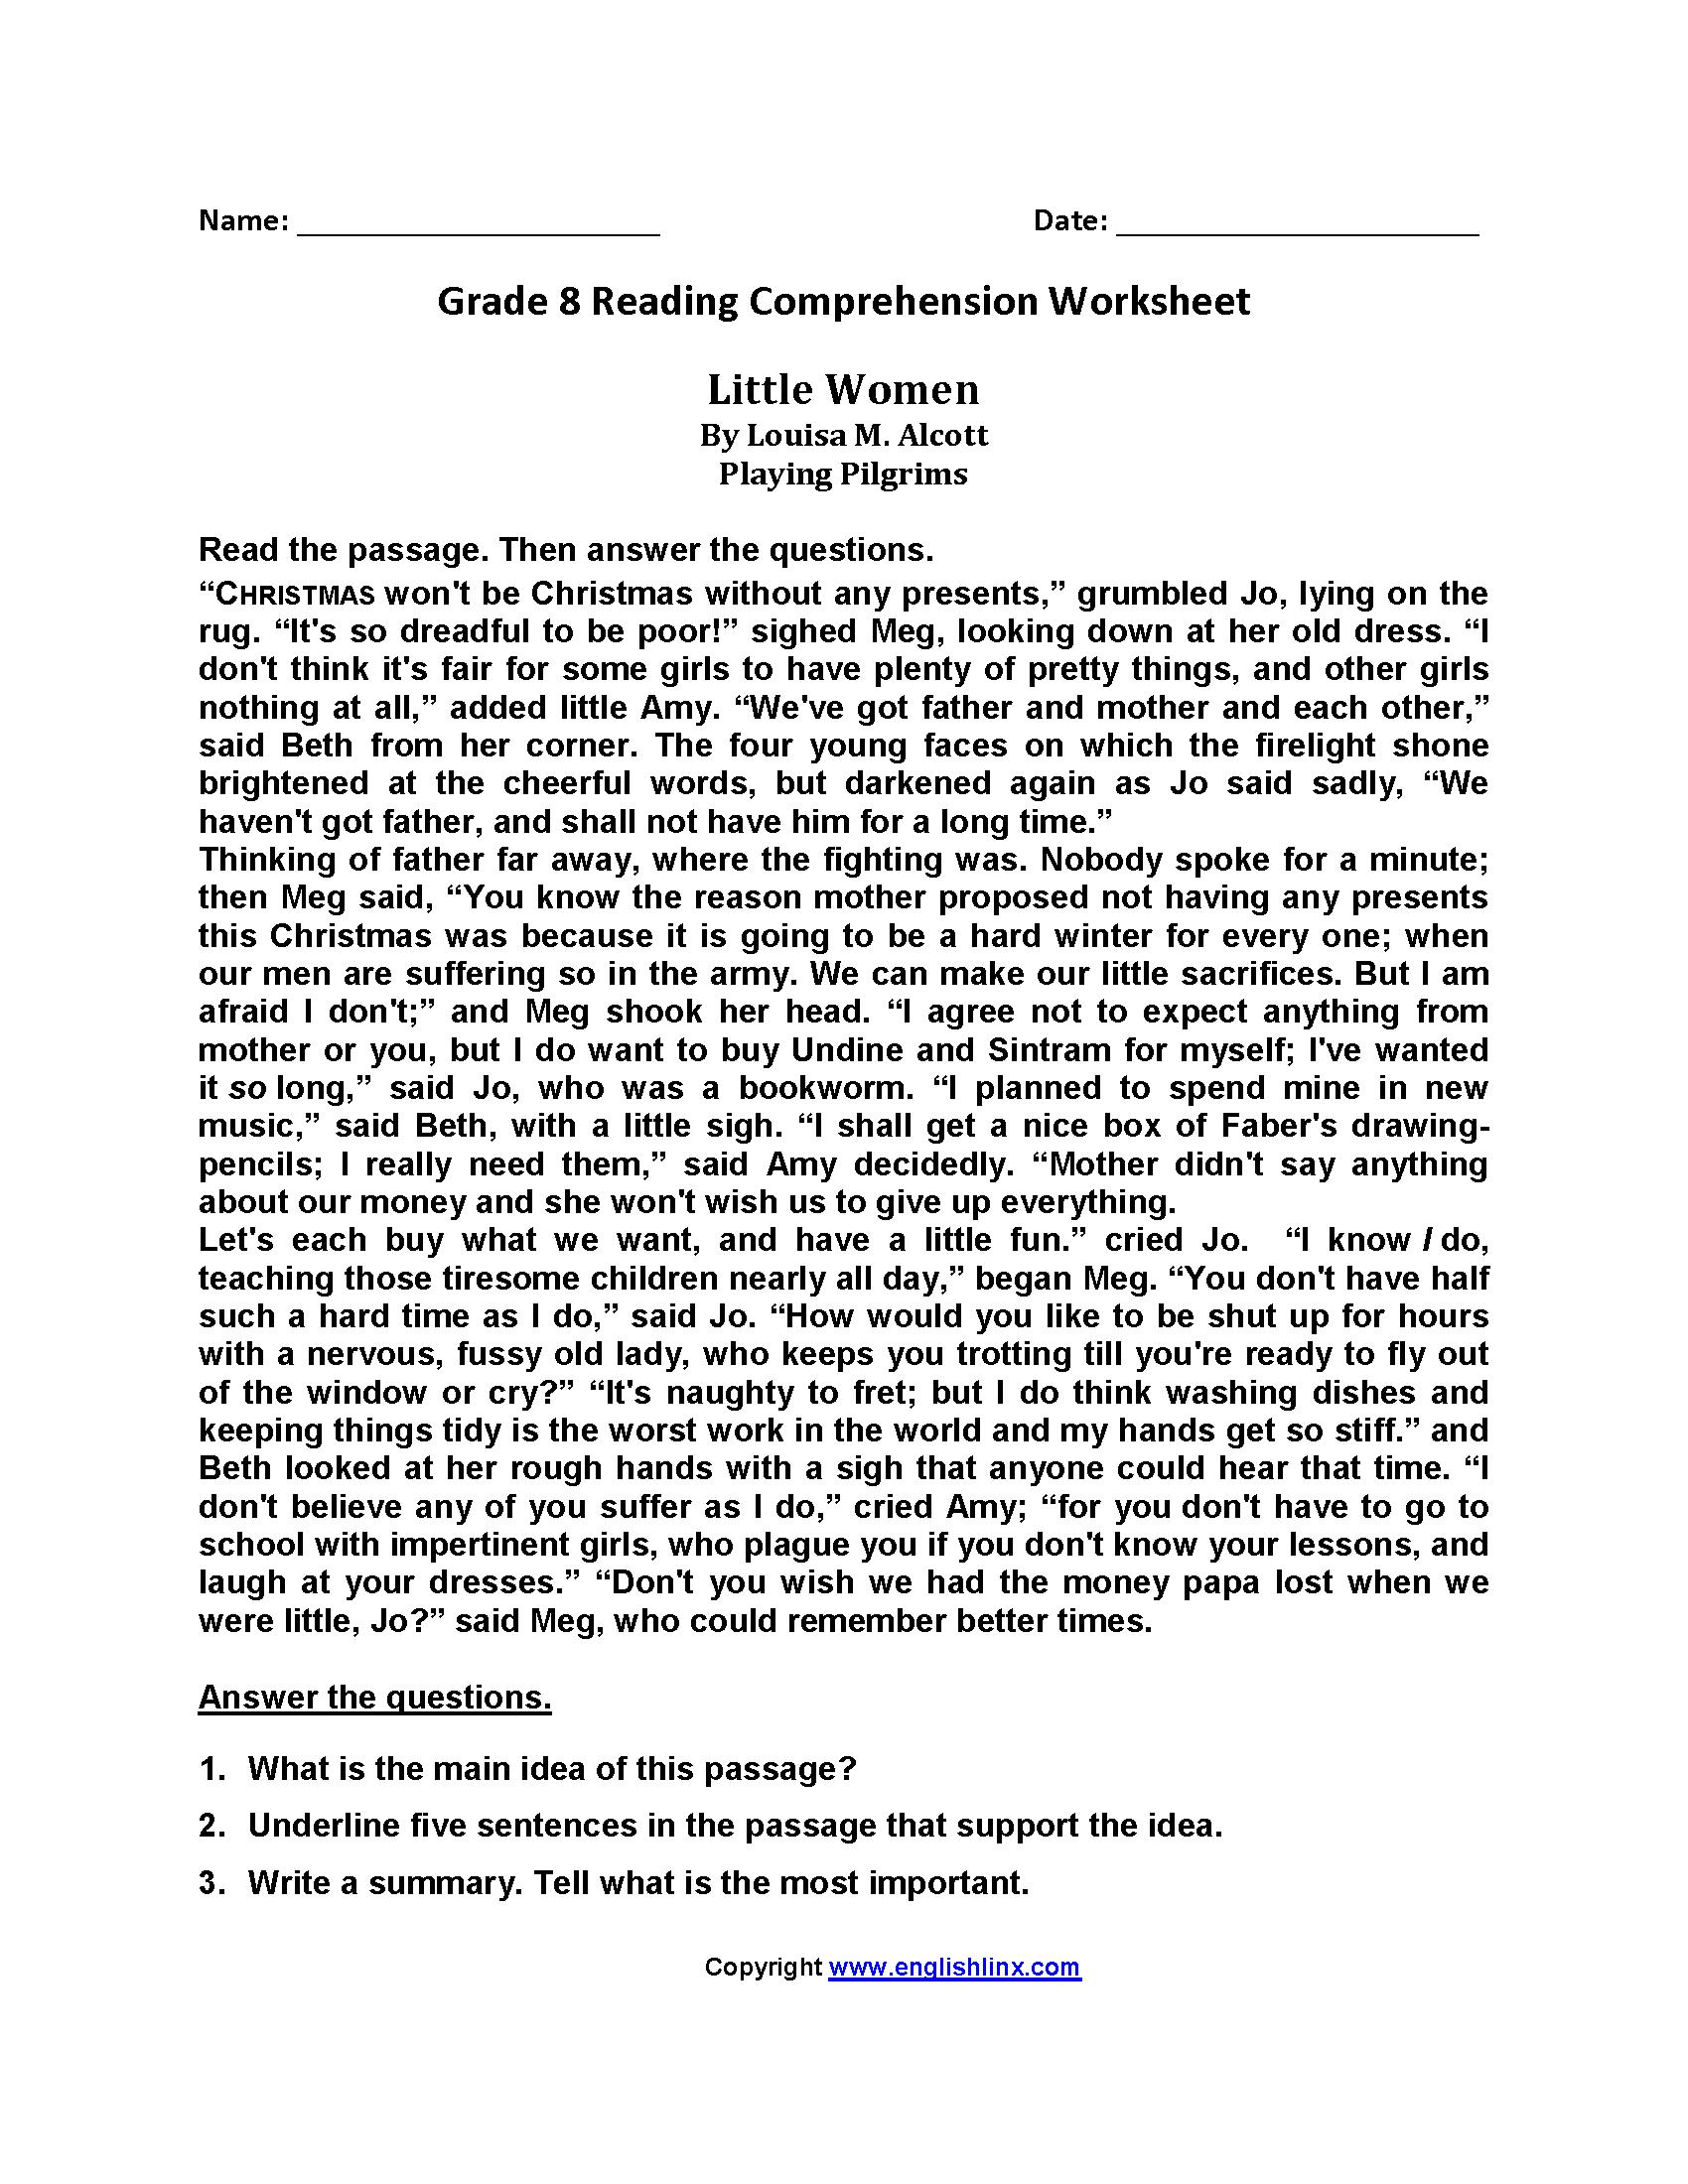 Little Women Eighth Grade Reading Worksheets   Reading comprehension  worksheets [ 2200 x 1700 Pixel ]